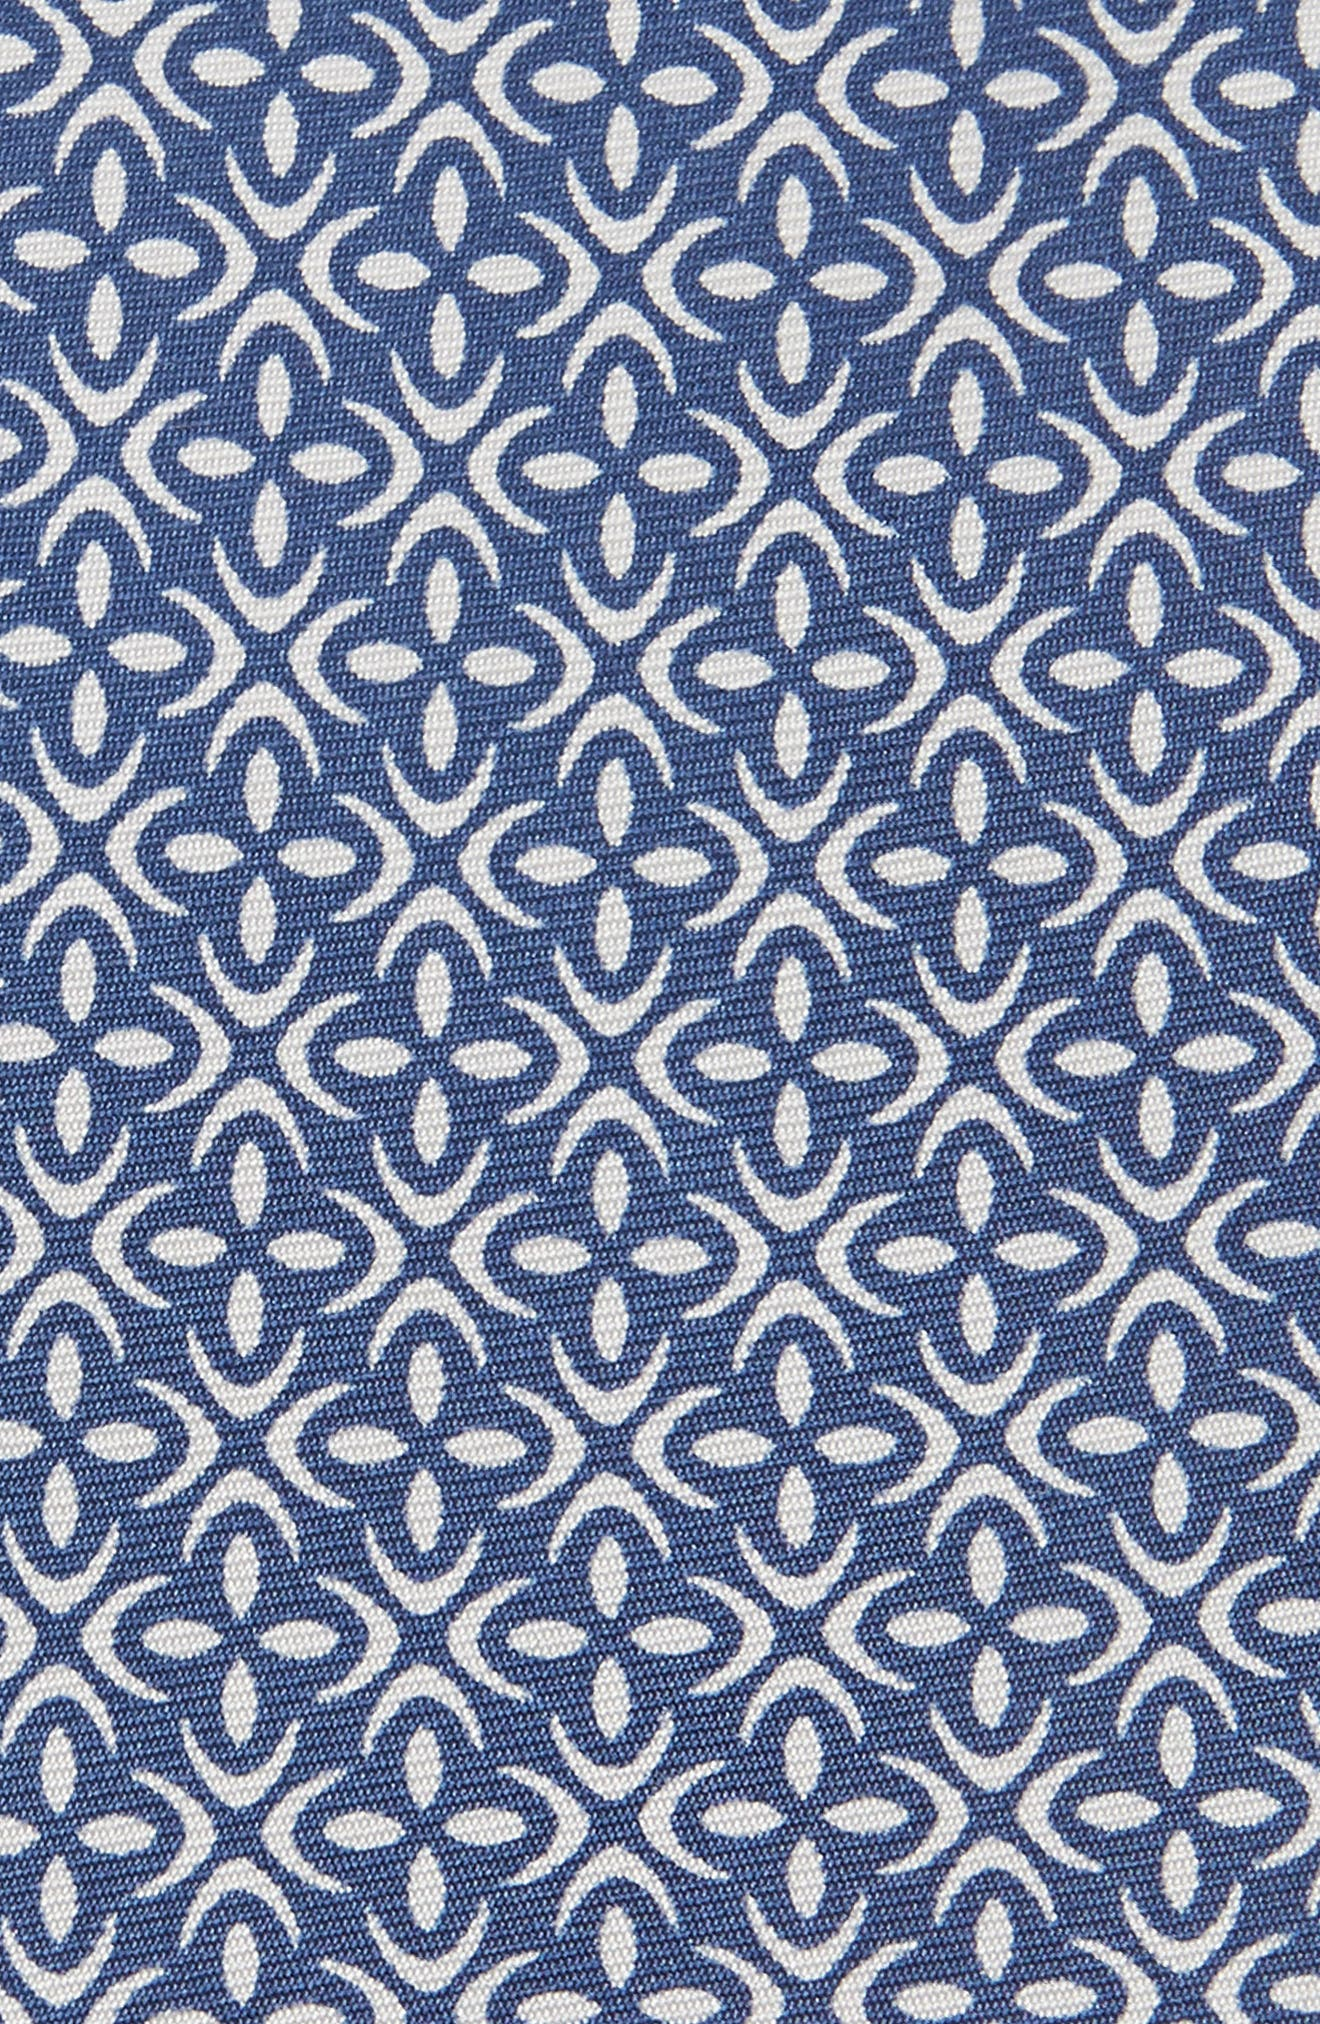 Fischer Geometric Skinny Silk Tie,                             Alternate thumbnail 2, color,                             400